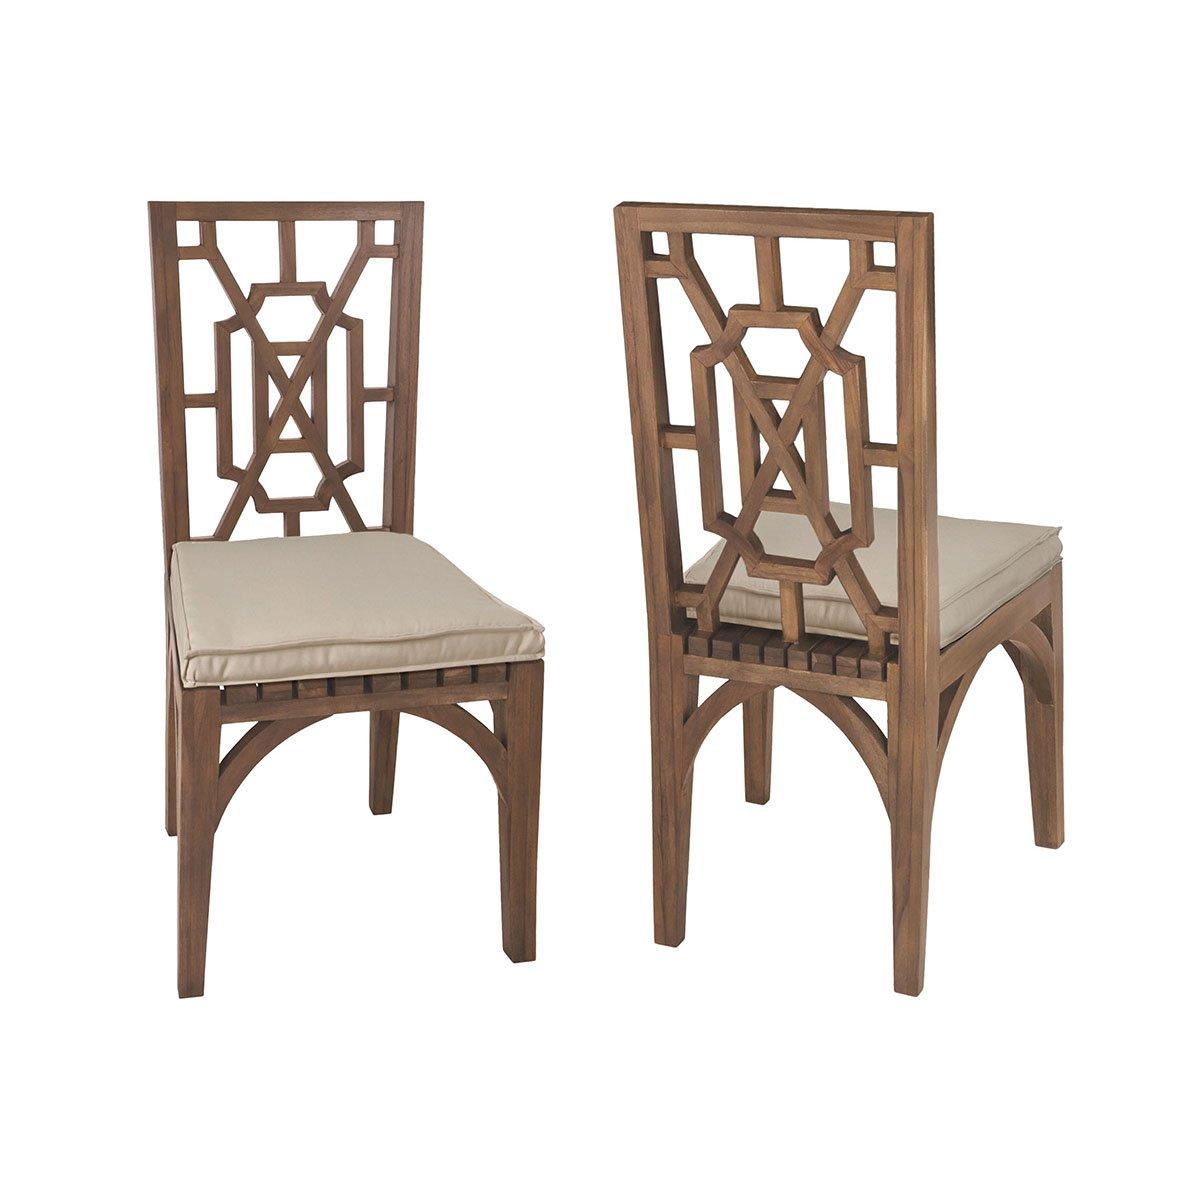 Teak Garden Dining Chair Cushion In Cream Teak Chairs Dining Chair Cushions Outdoor Dining Chair Cushions